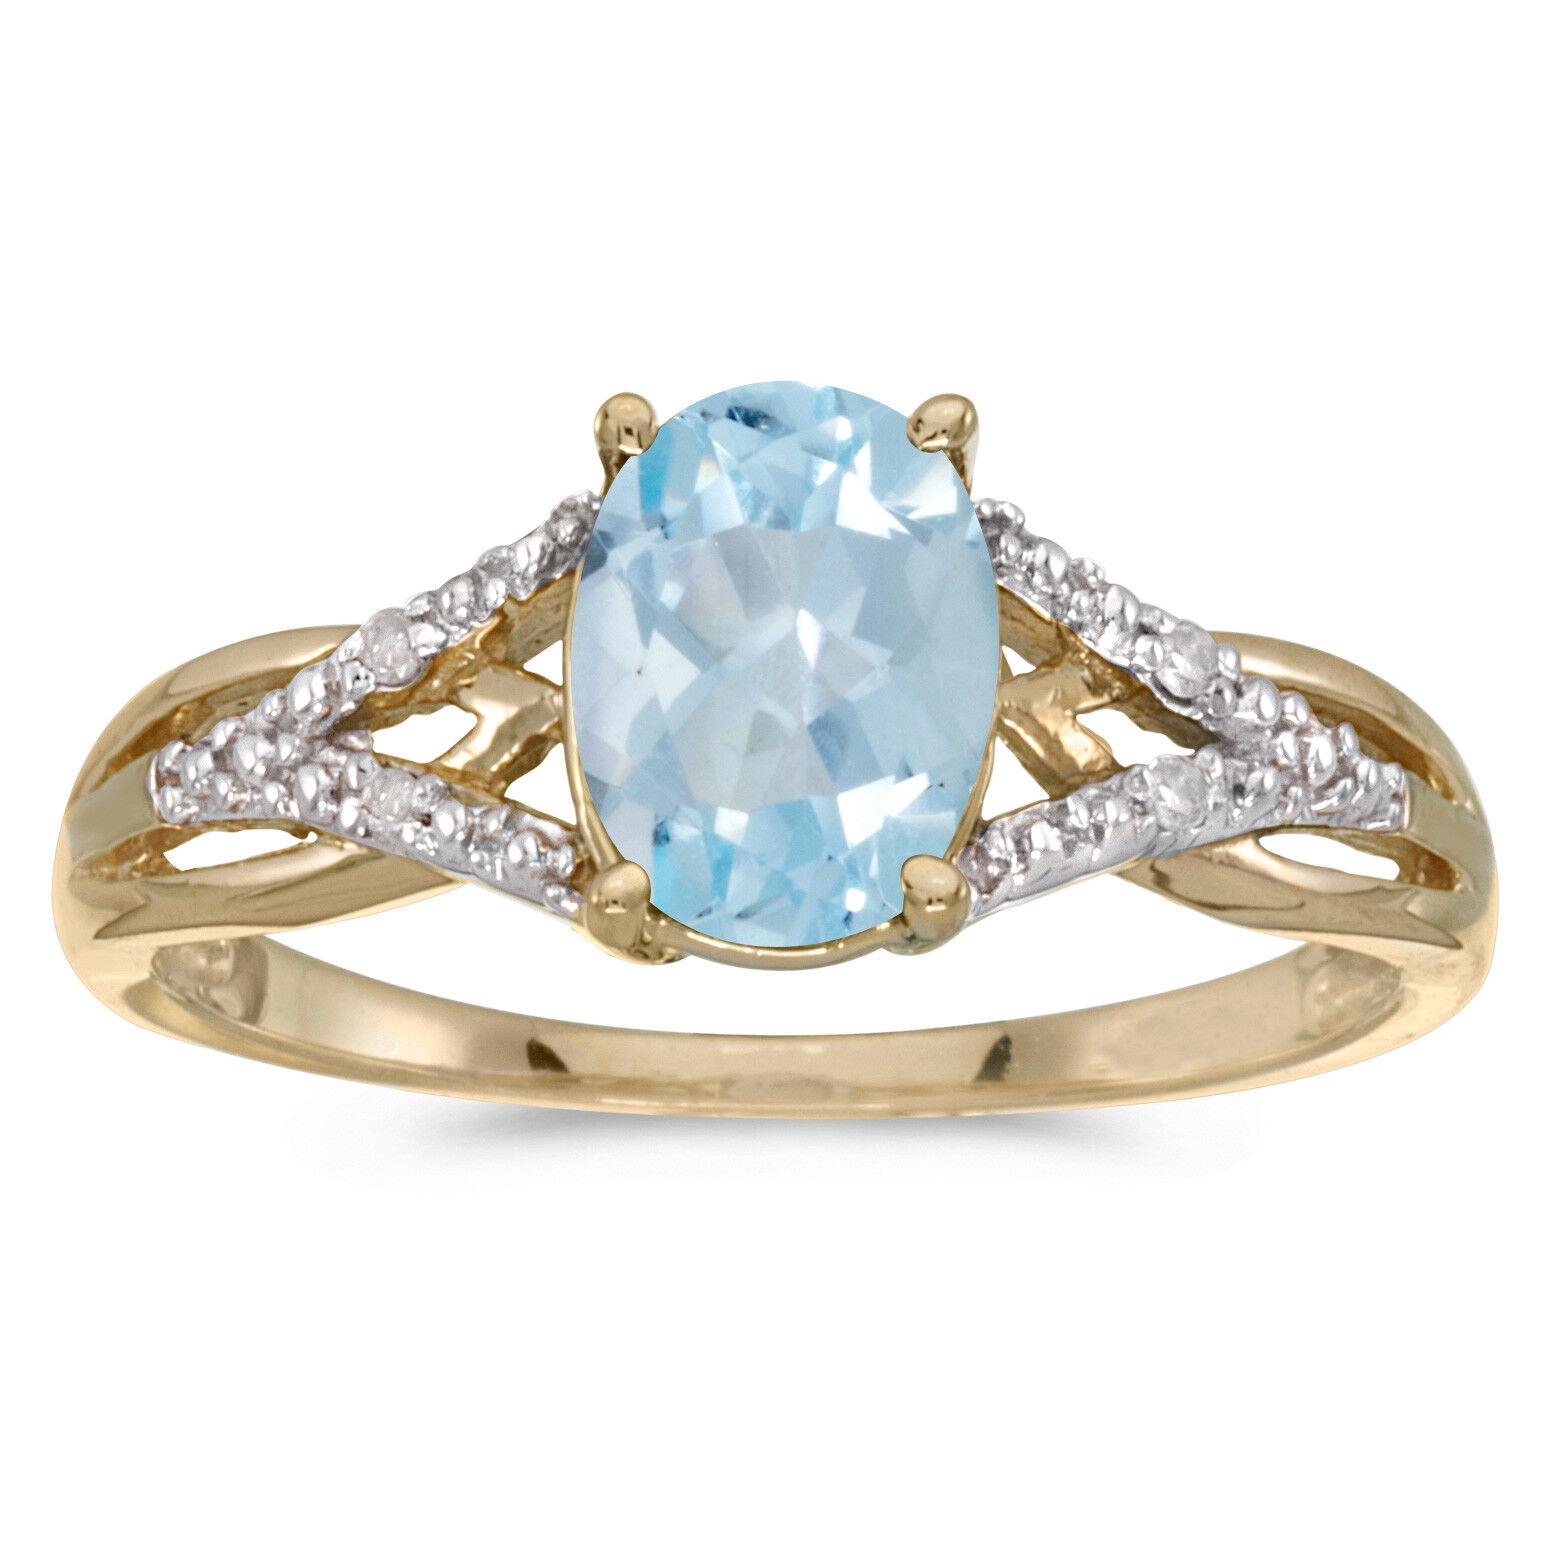 14k Yellow gold Oval Aquamarine And Diamond Ring